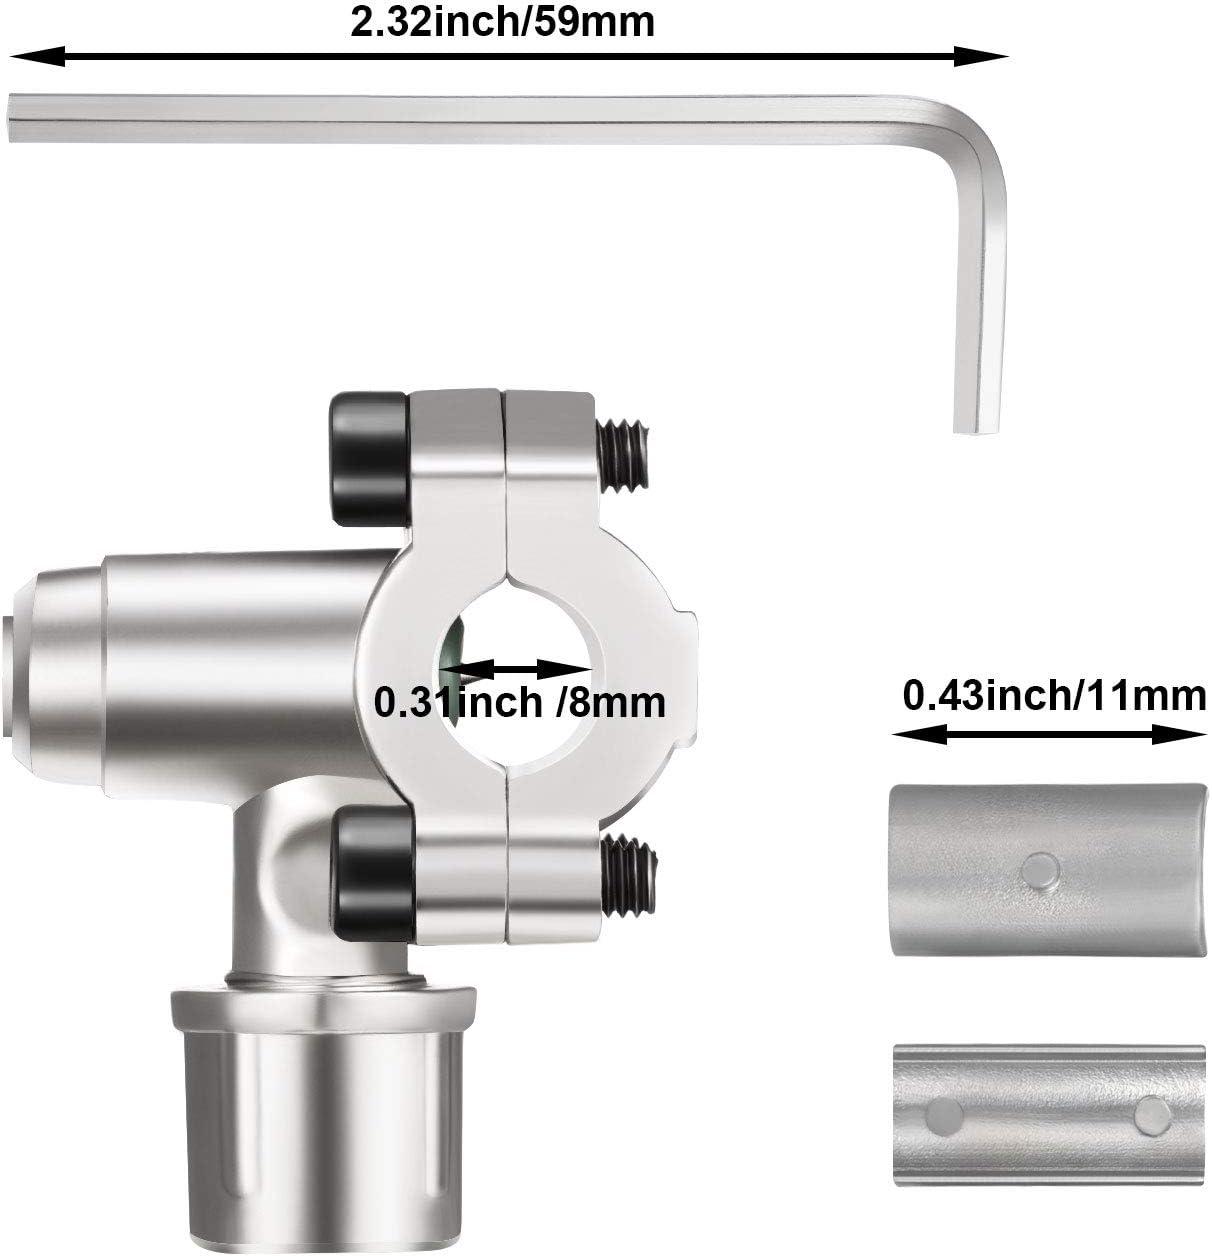 2pack BPV-31 Bullet Piercing Tap Valve Kits Refrigerant Charging Hose with Gauge